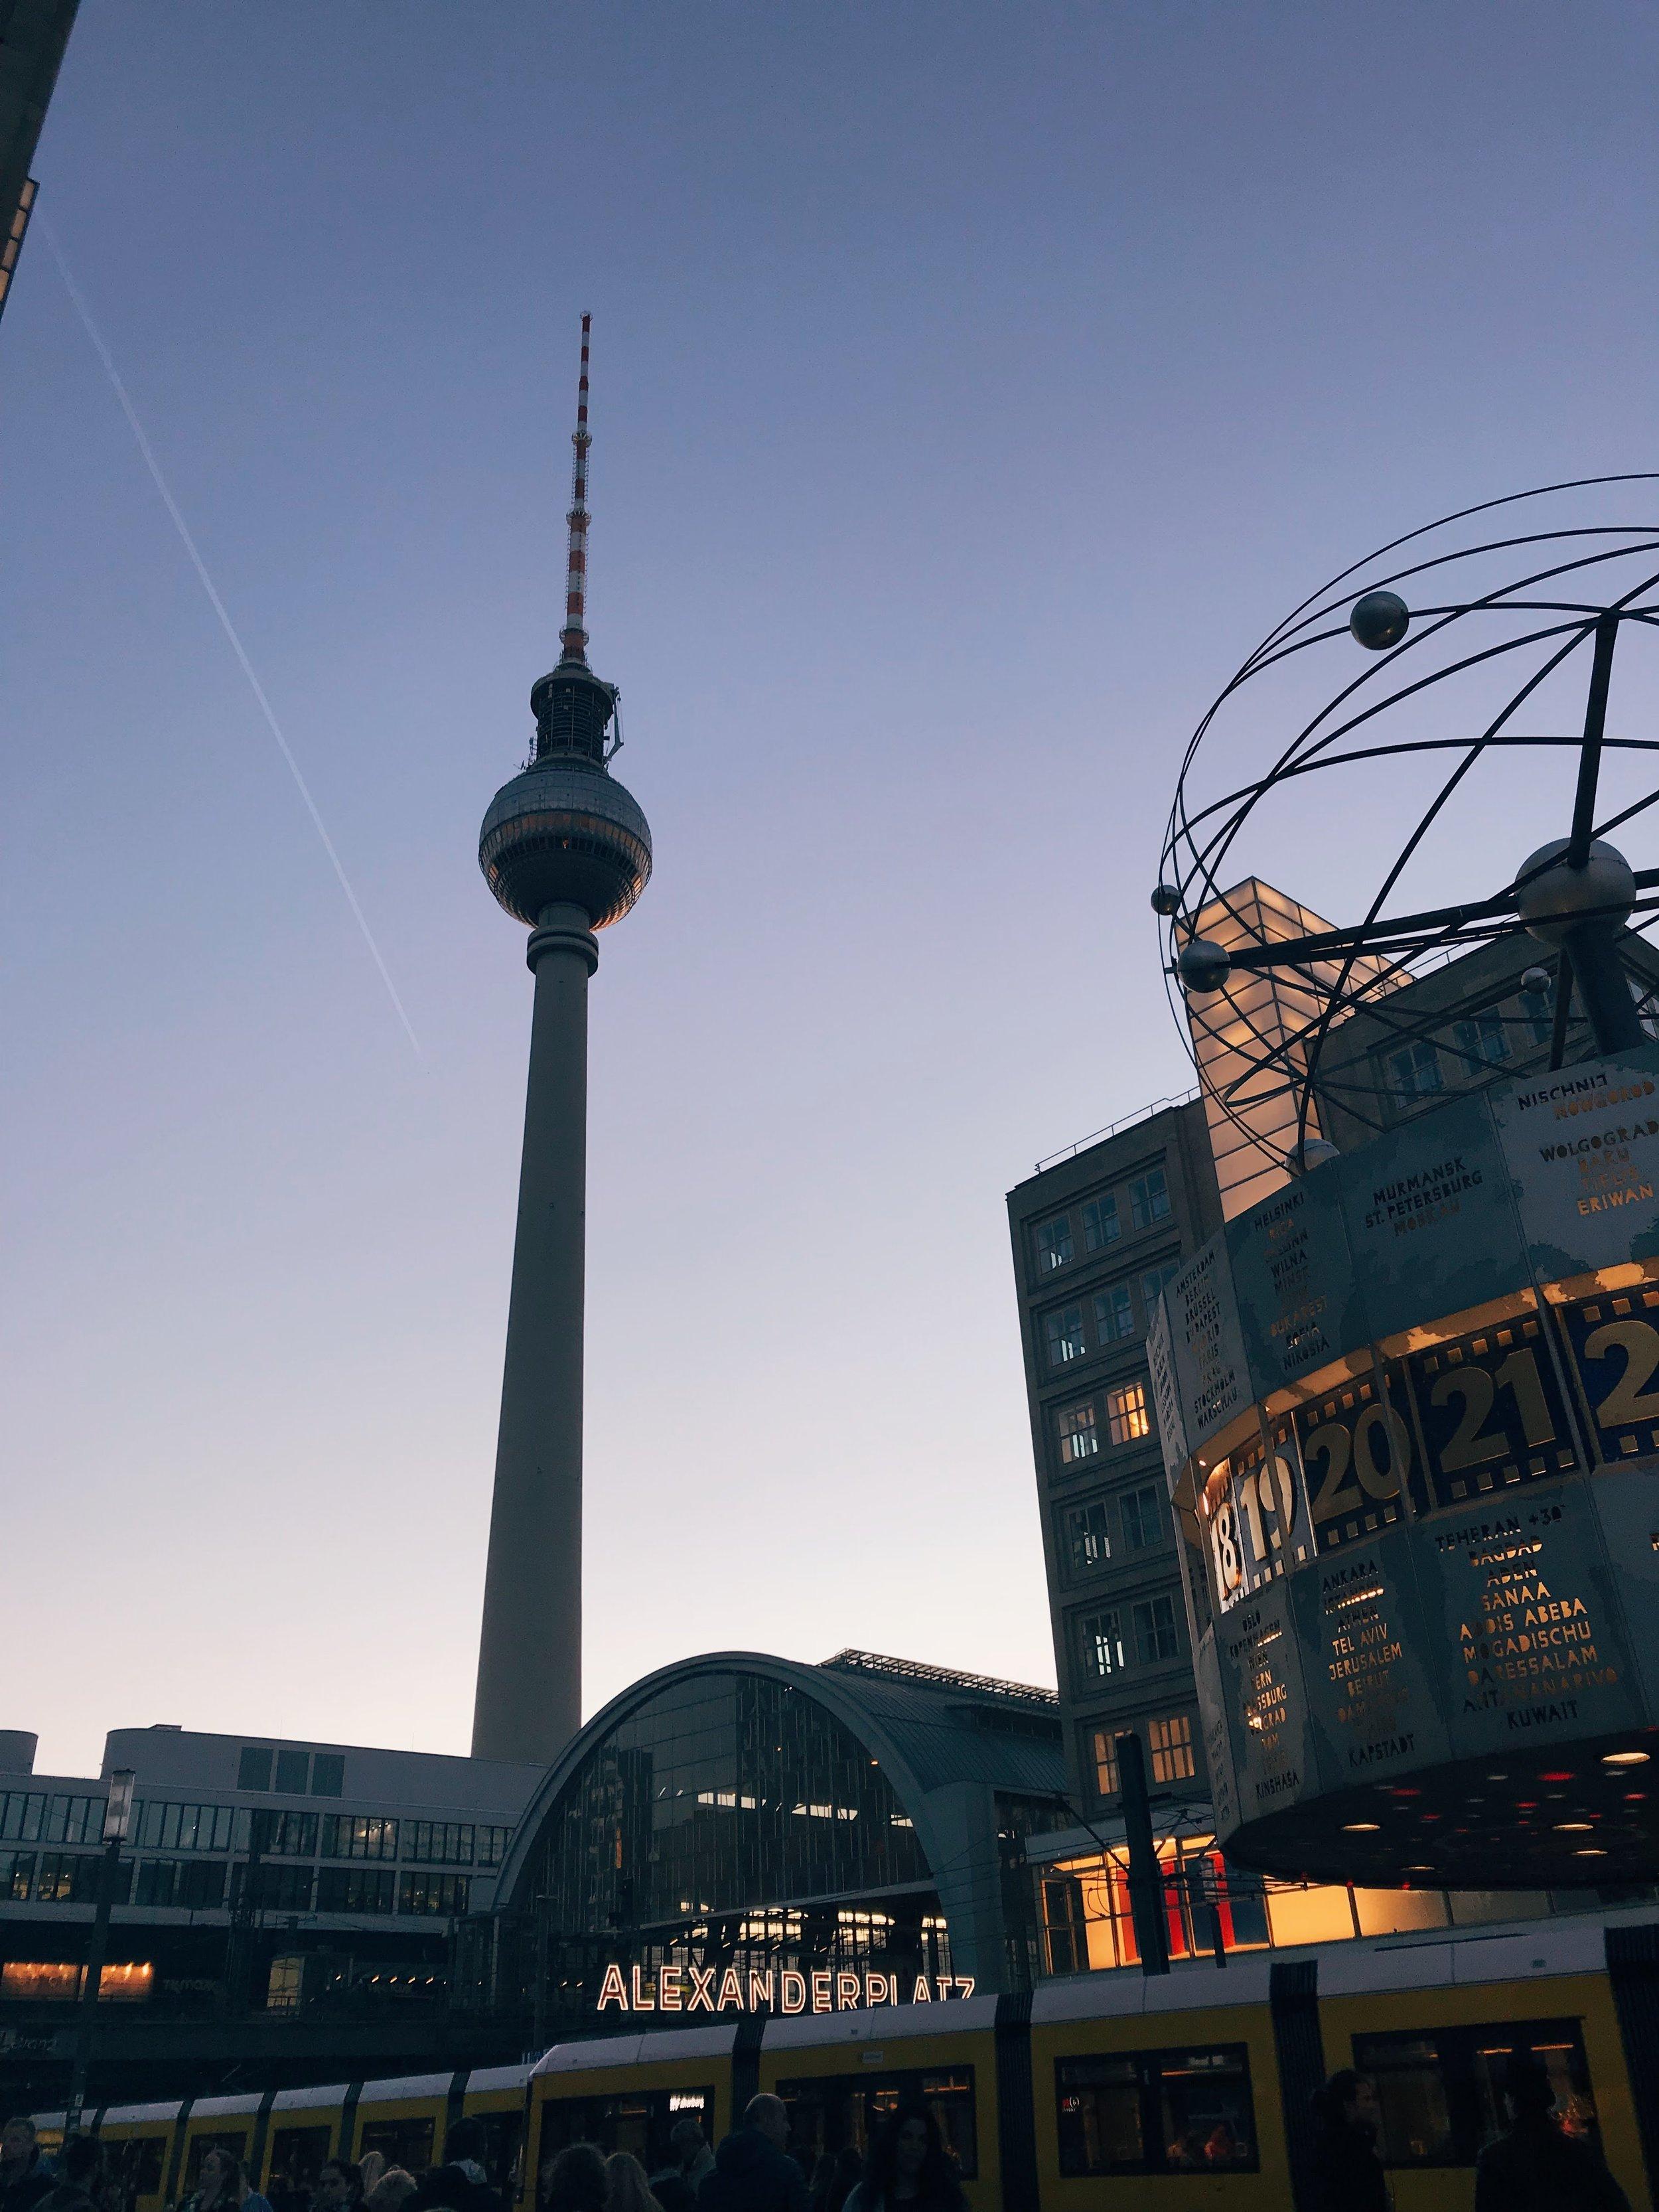 Alexanderplatz area (TV Tower)